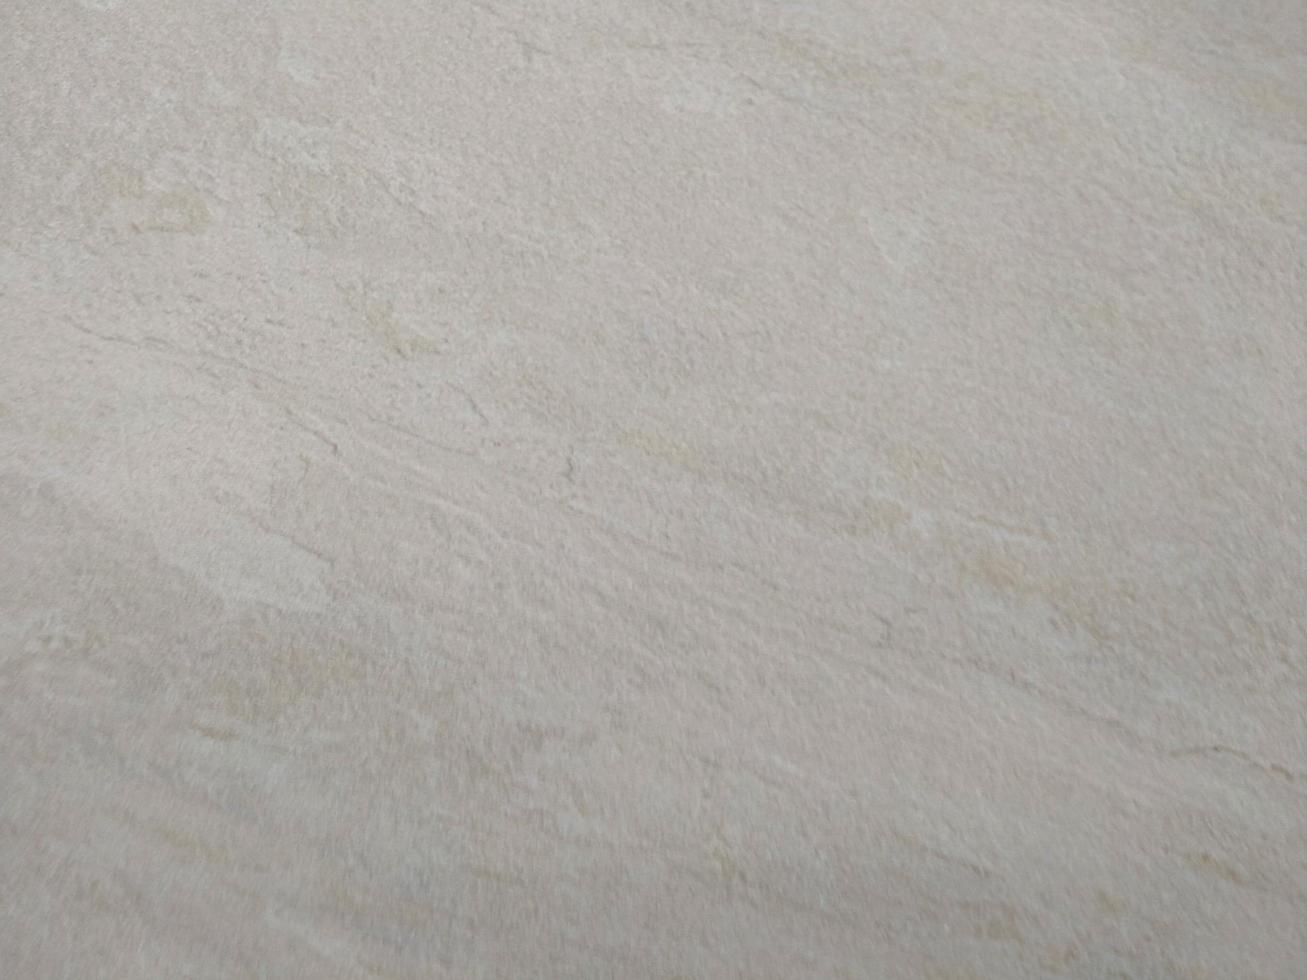 grijs betonnen oppervlak foto